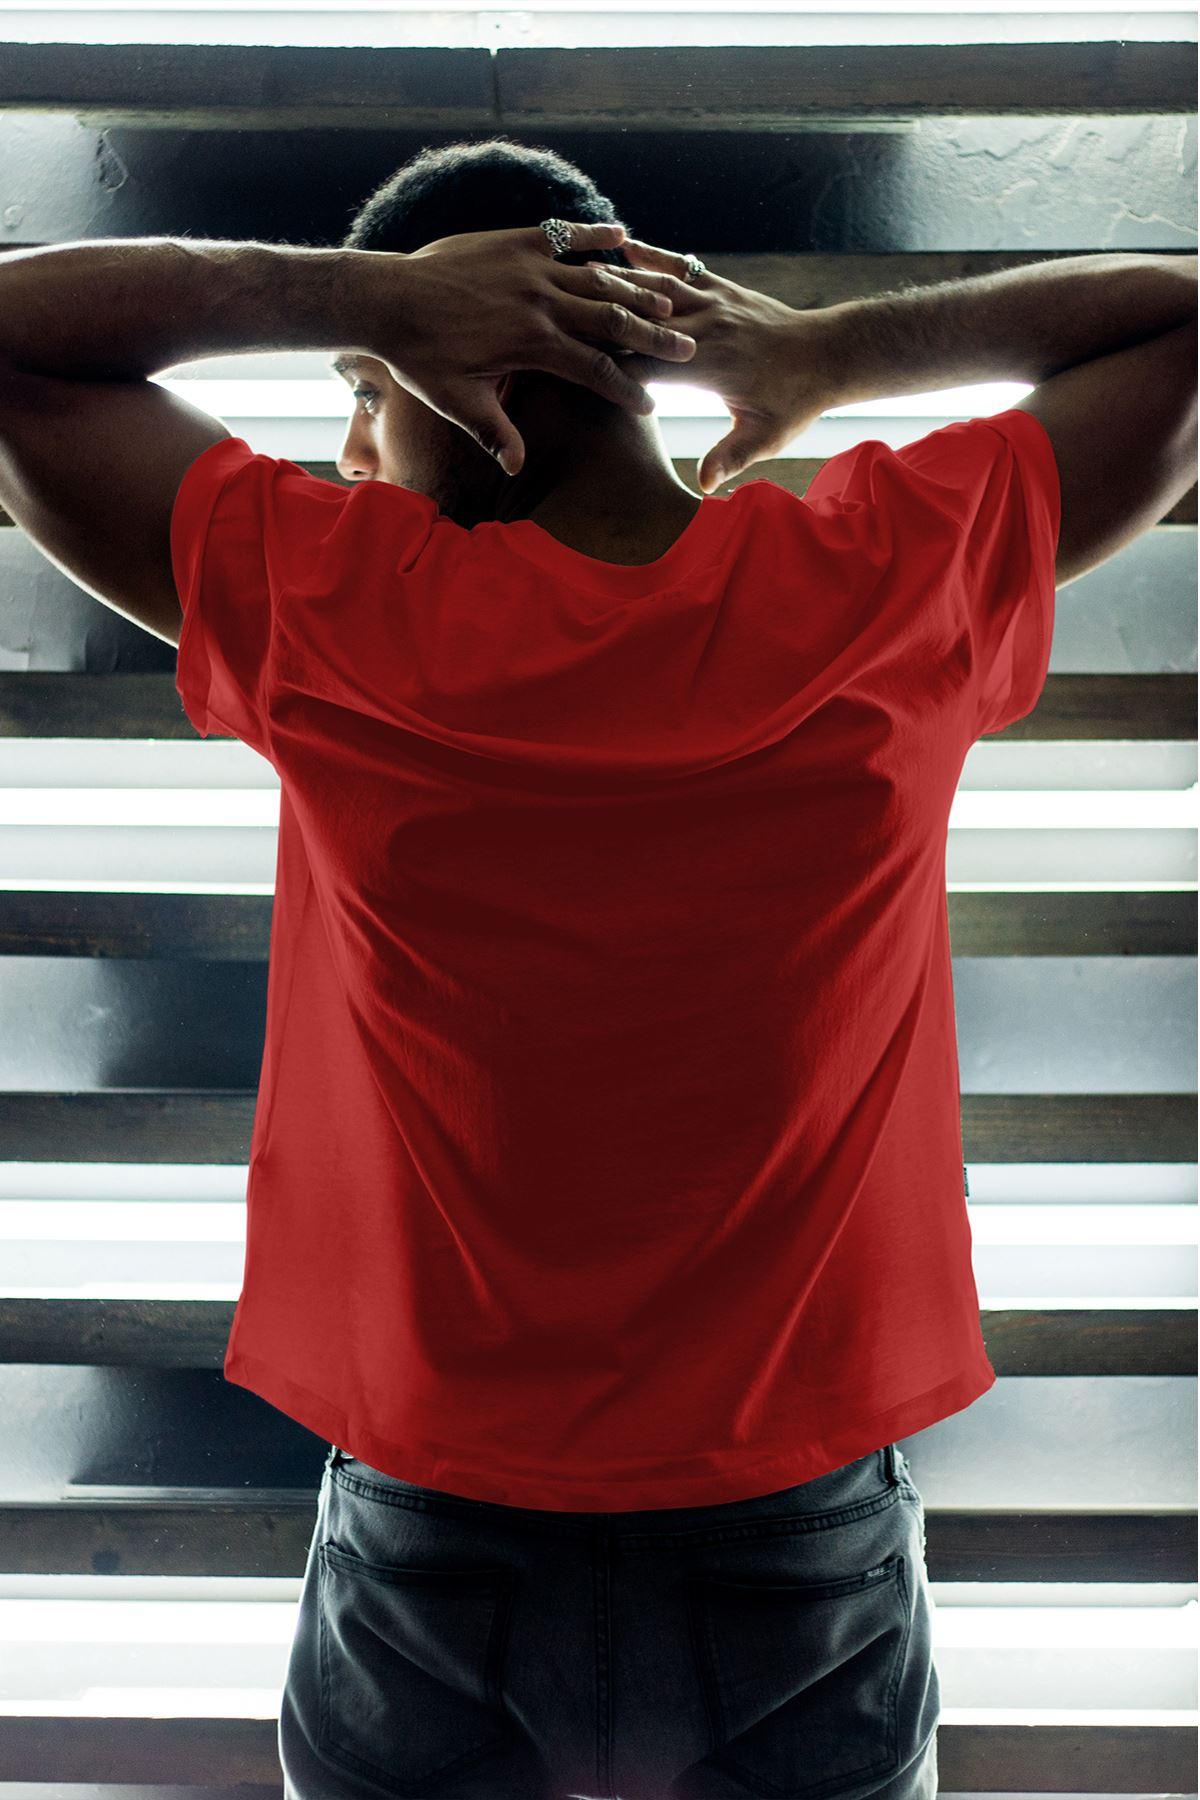 Cleveland 04 Kırmızı Erkek Oversize Tshirt - Tişört